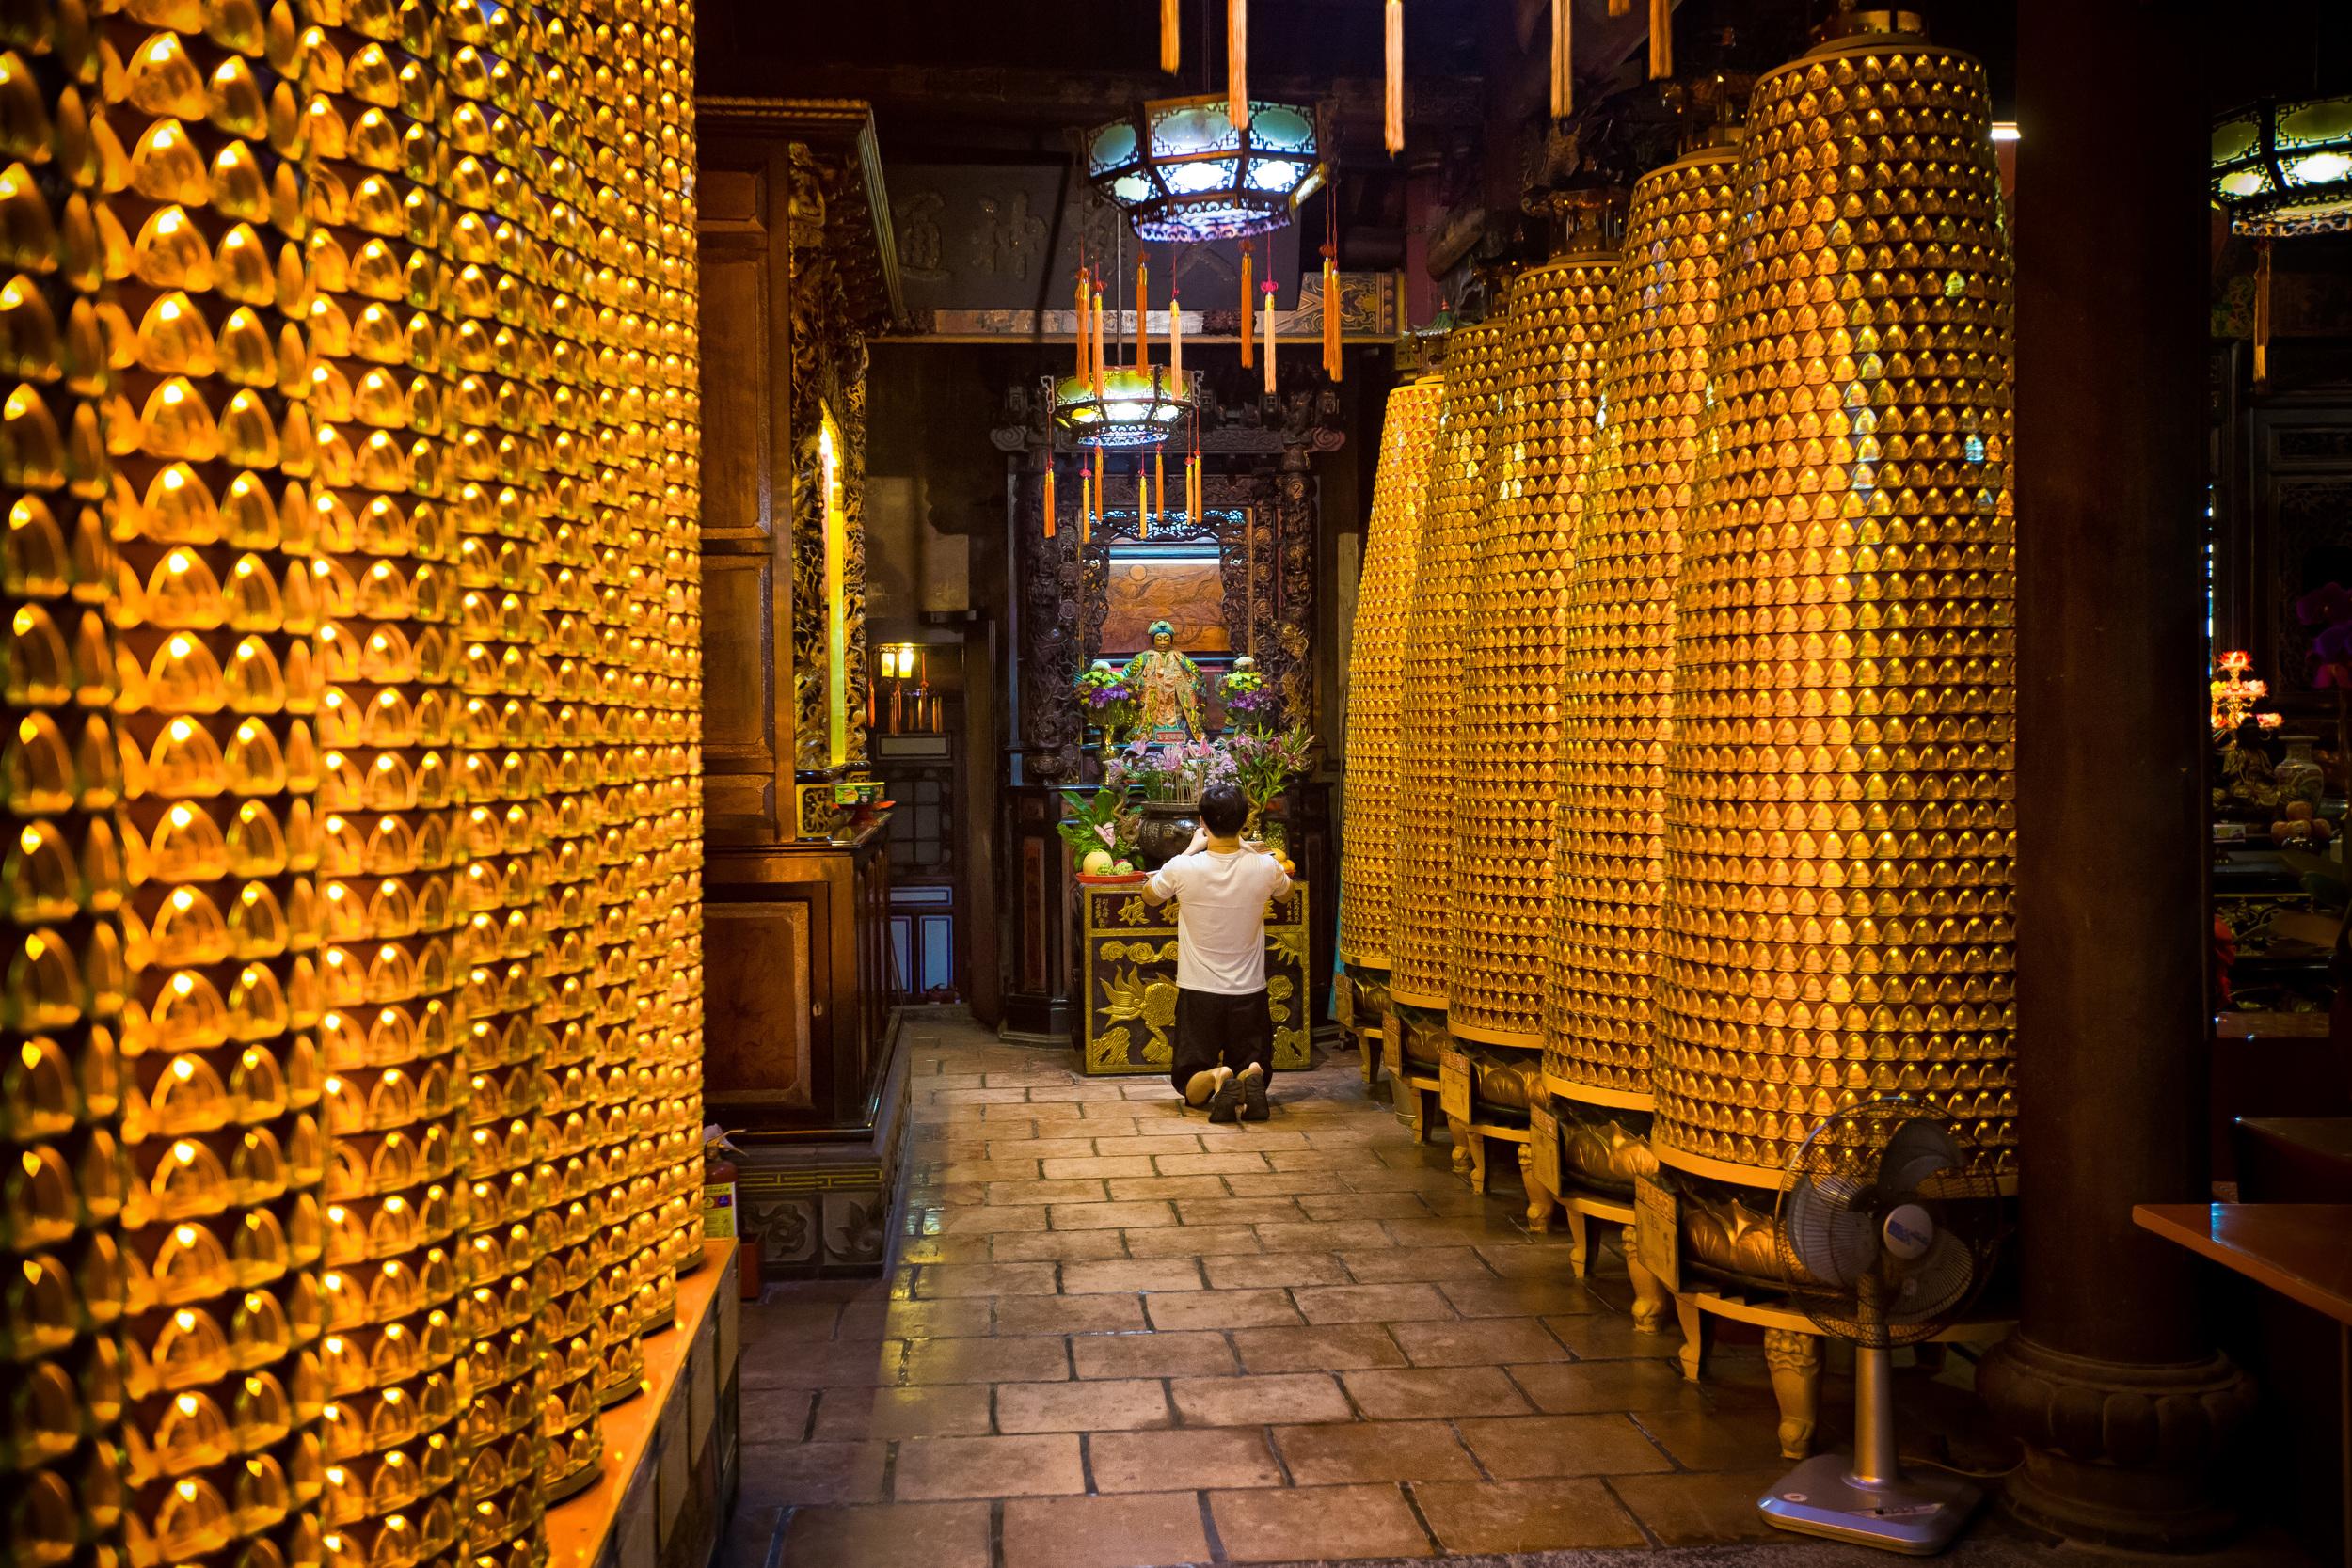 A Taiwanese man praying at an altar in Ciyou Temple (  慈祐宮)